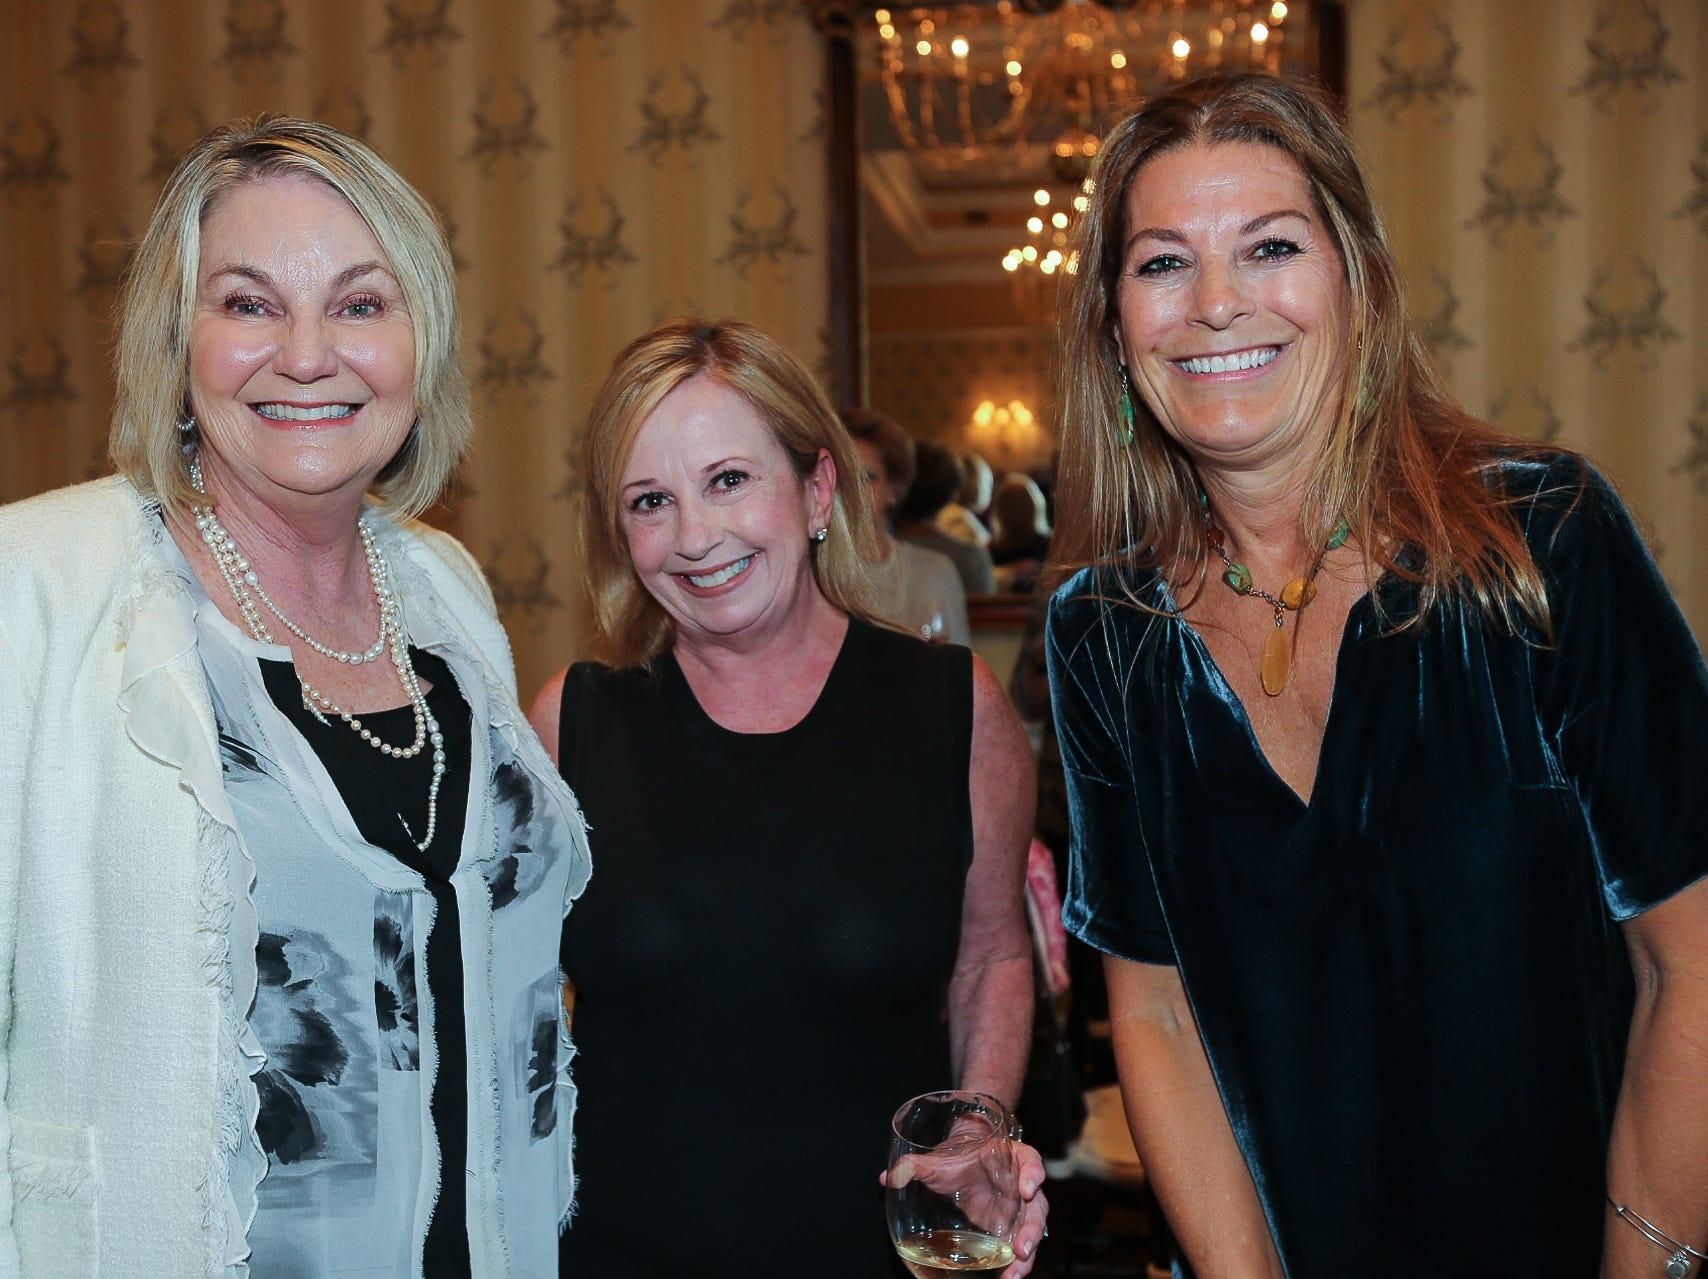 Buffy Butler, Terry O'Shell, and Silvia Sheppard